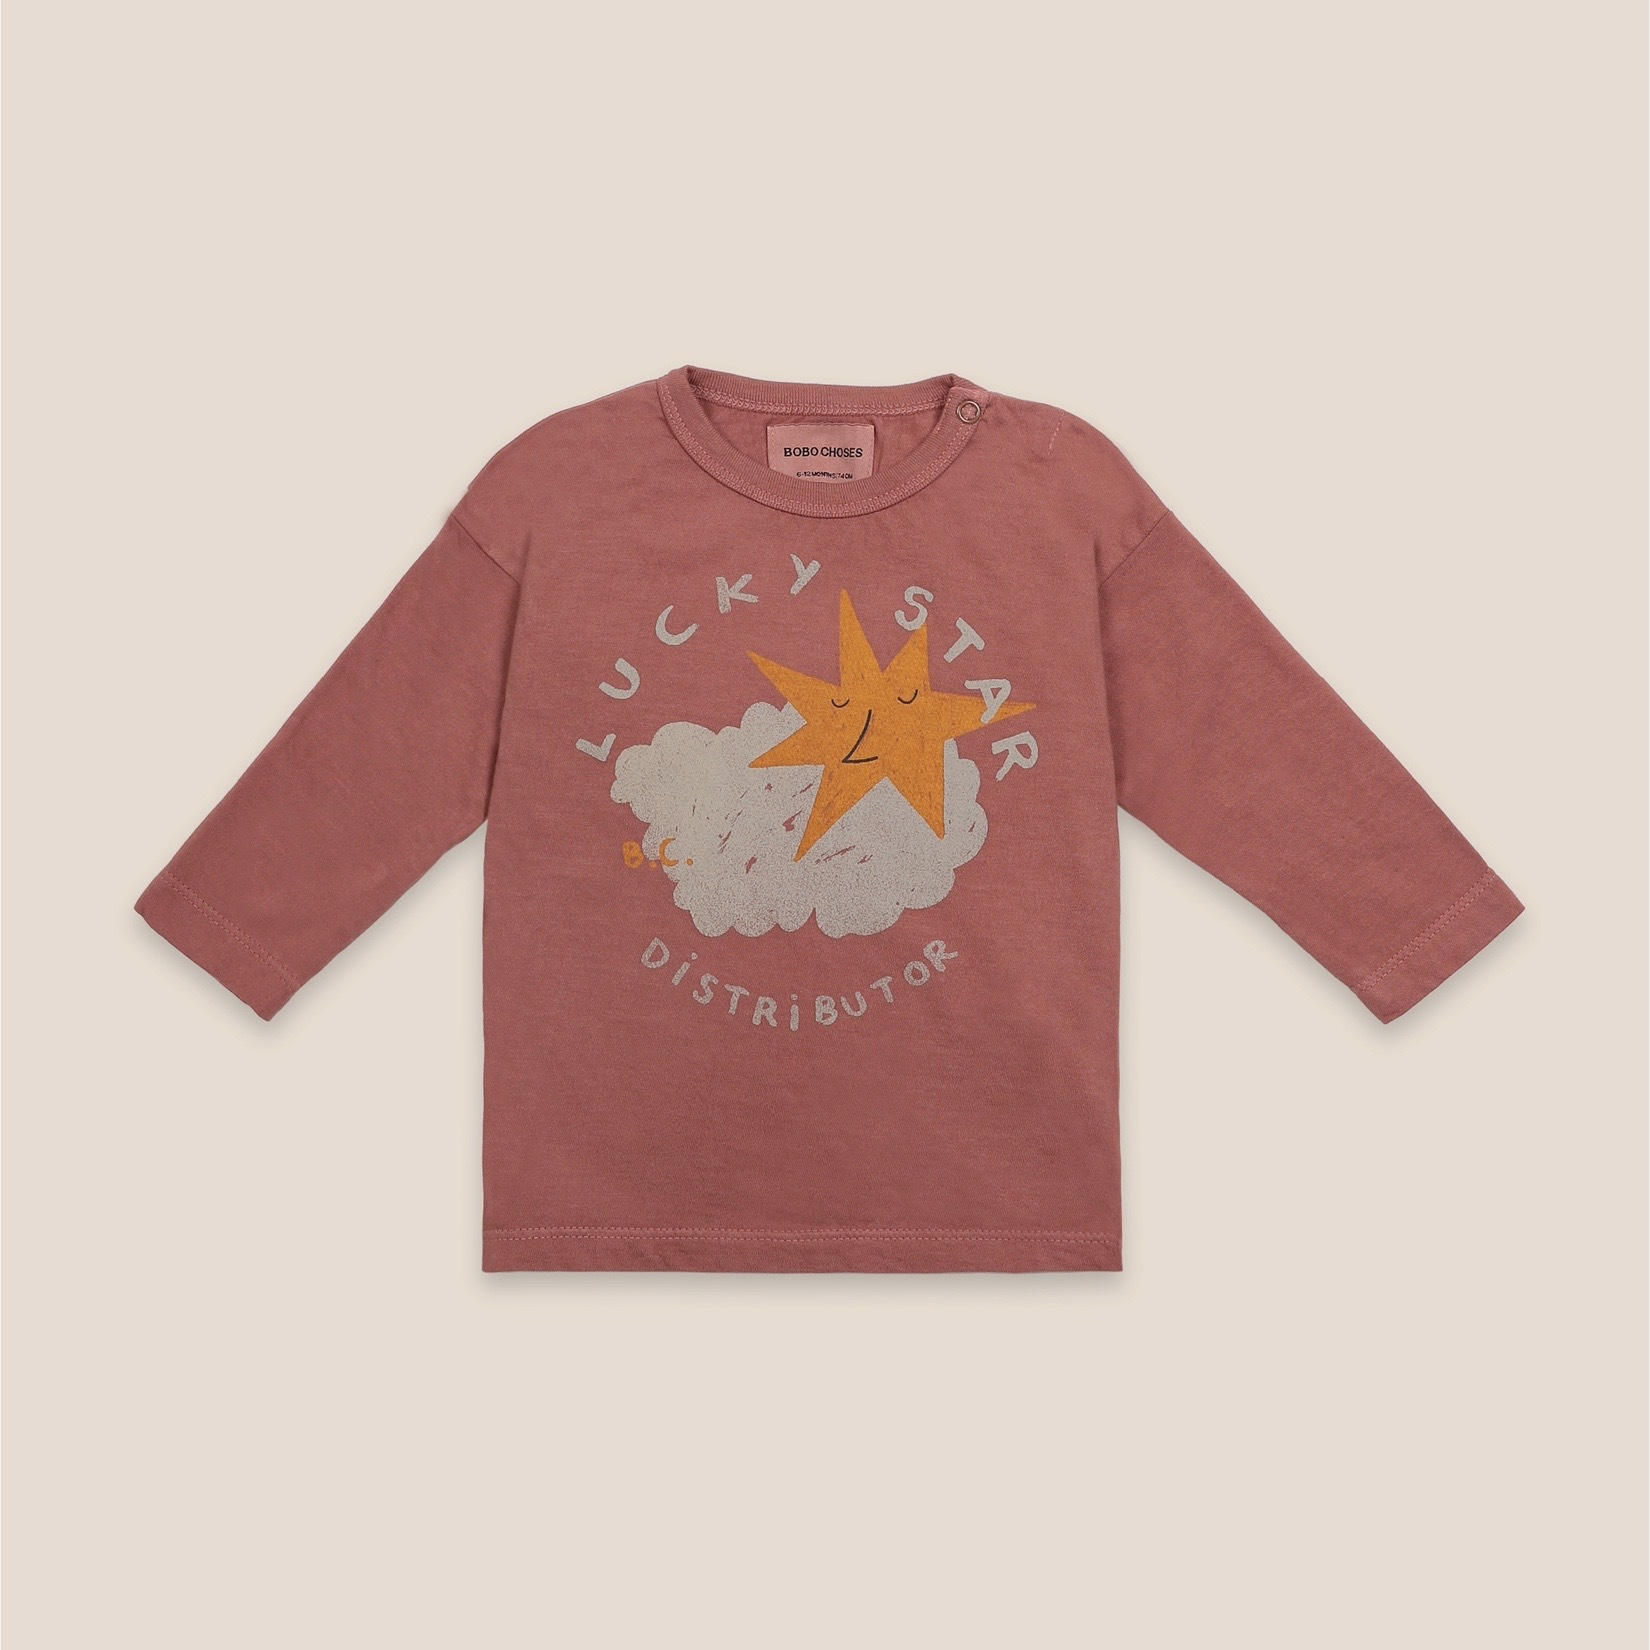 《BOBO CHOSES 2020AW》Lucky Star long sleeve T-shirt / 6-36M